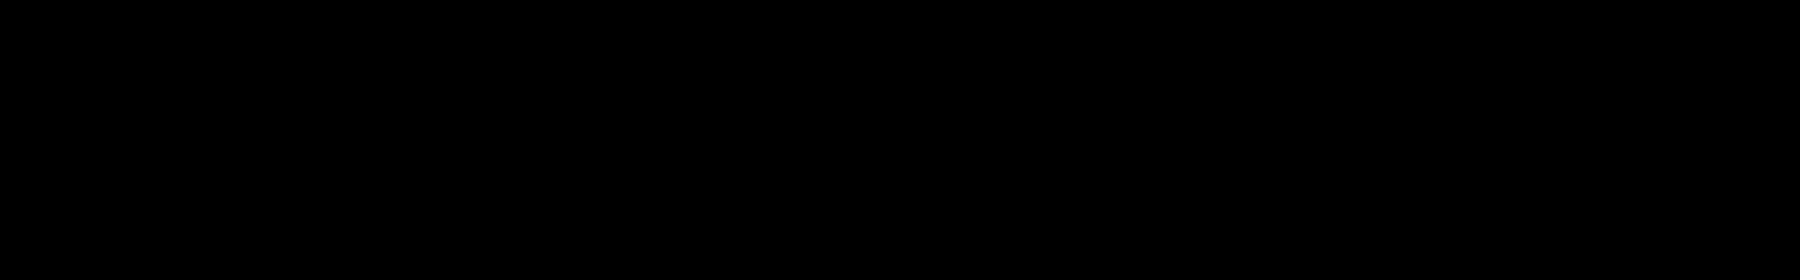 Tunecraft Ethereal Chord Progressions Vol.2 audio waveform